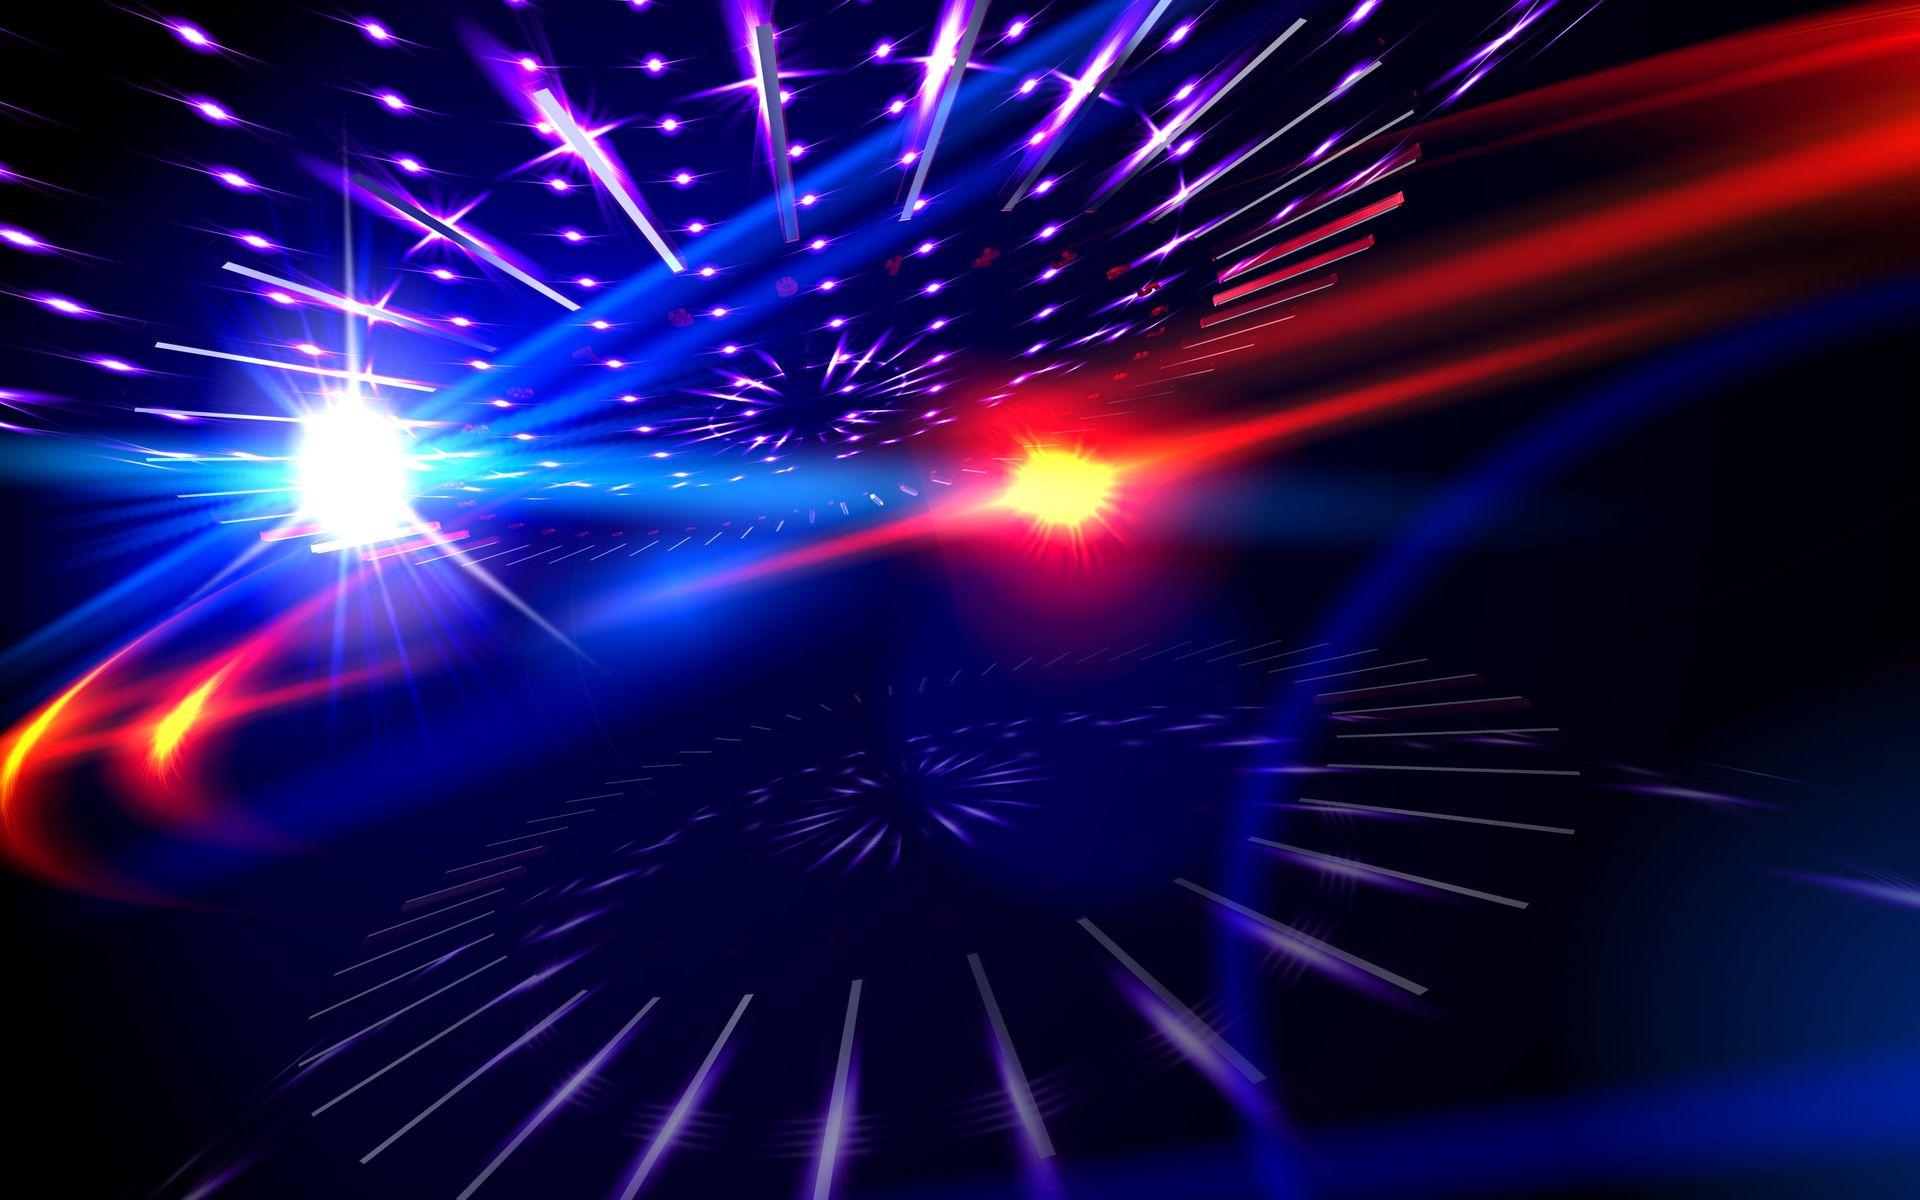 Dj Lights Wallpaper Download Hd 13931 Amazing Wallpaperz 1920x1200 Wallpaper Lit Wallpaper Disco Lights